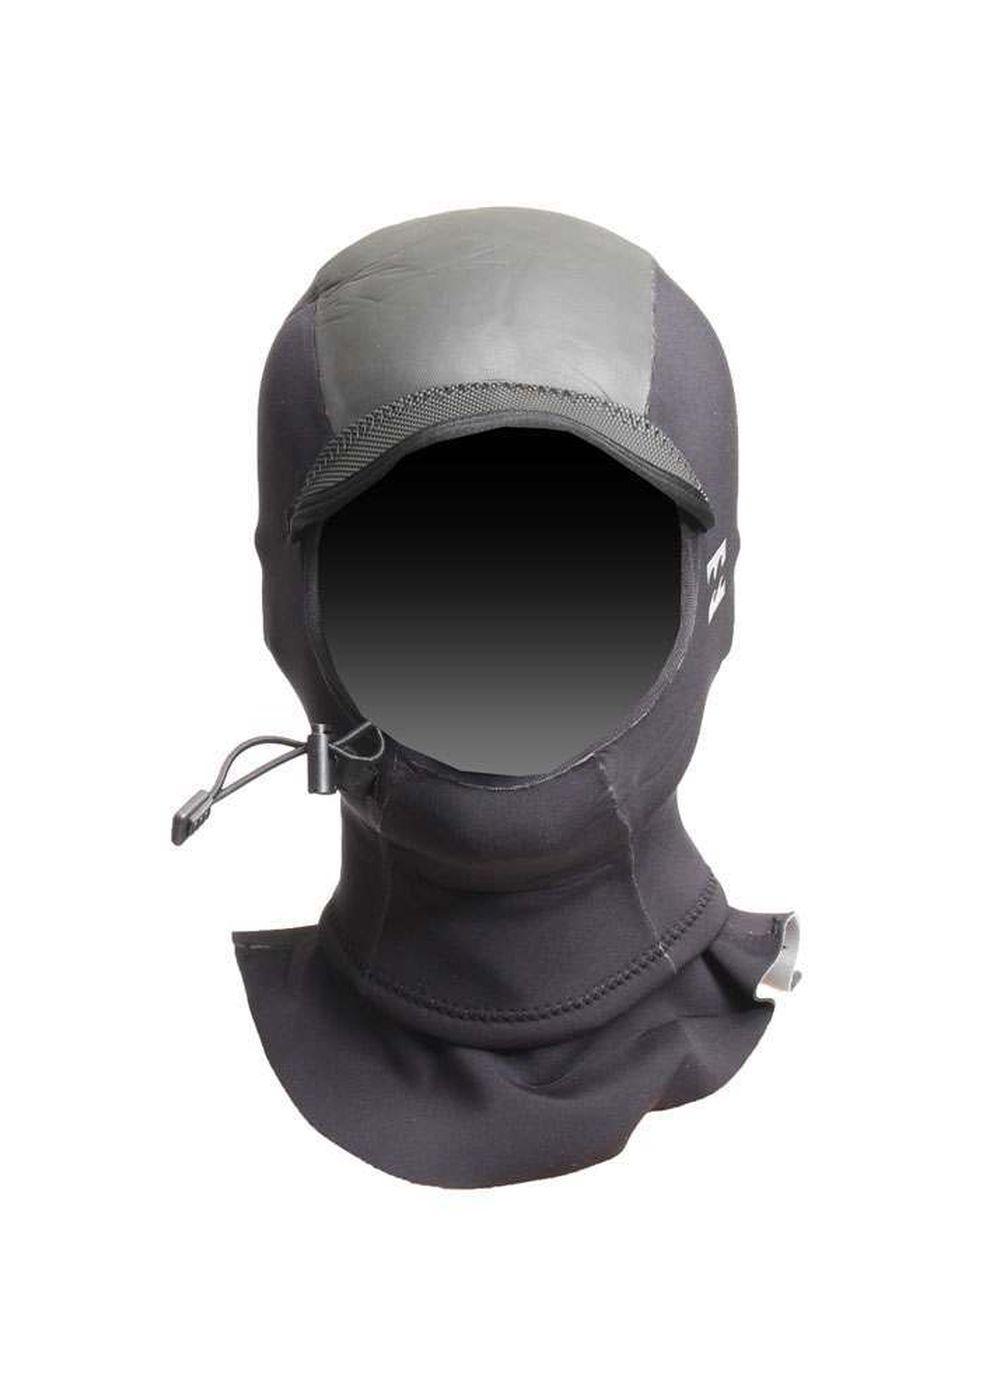 Billabong Xero Furnace 2mm Wetsuit Hood Picture